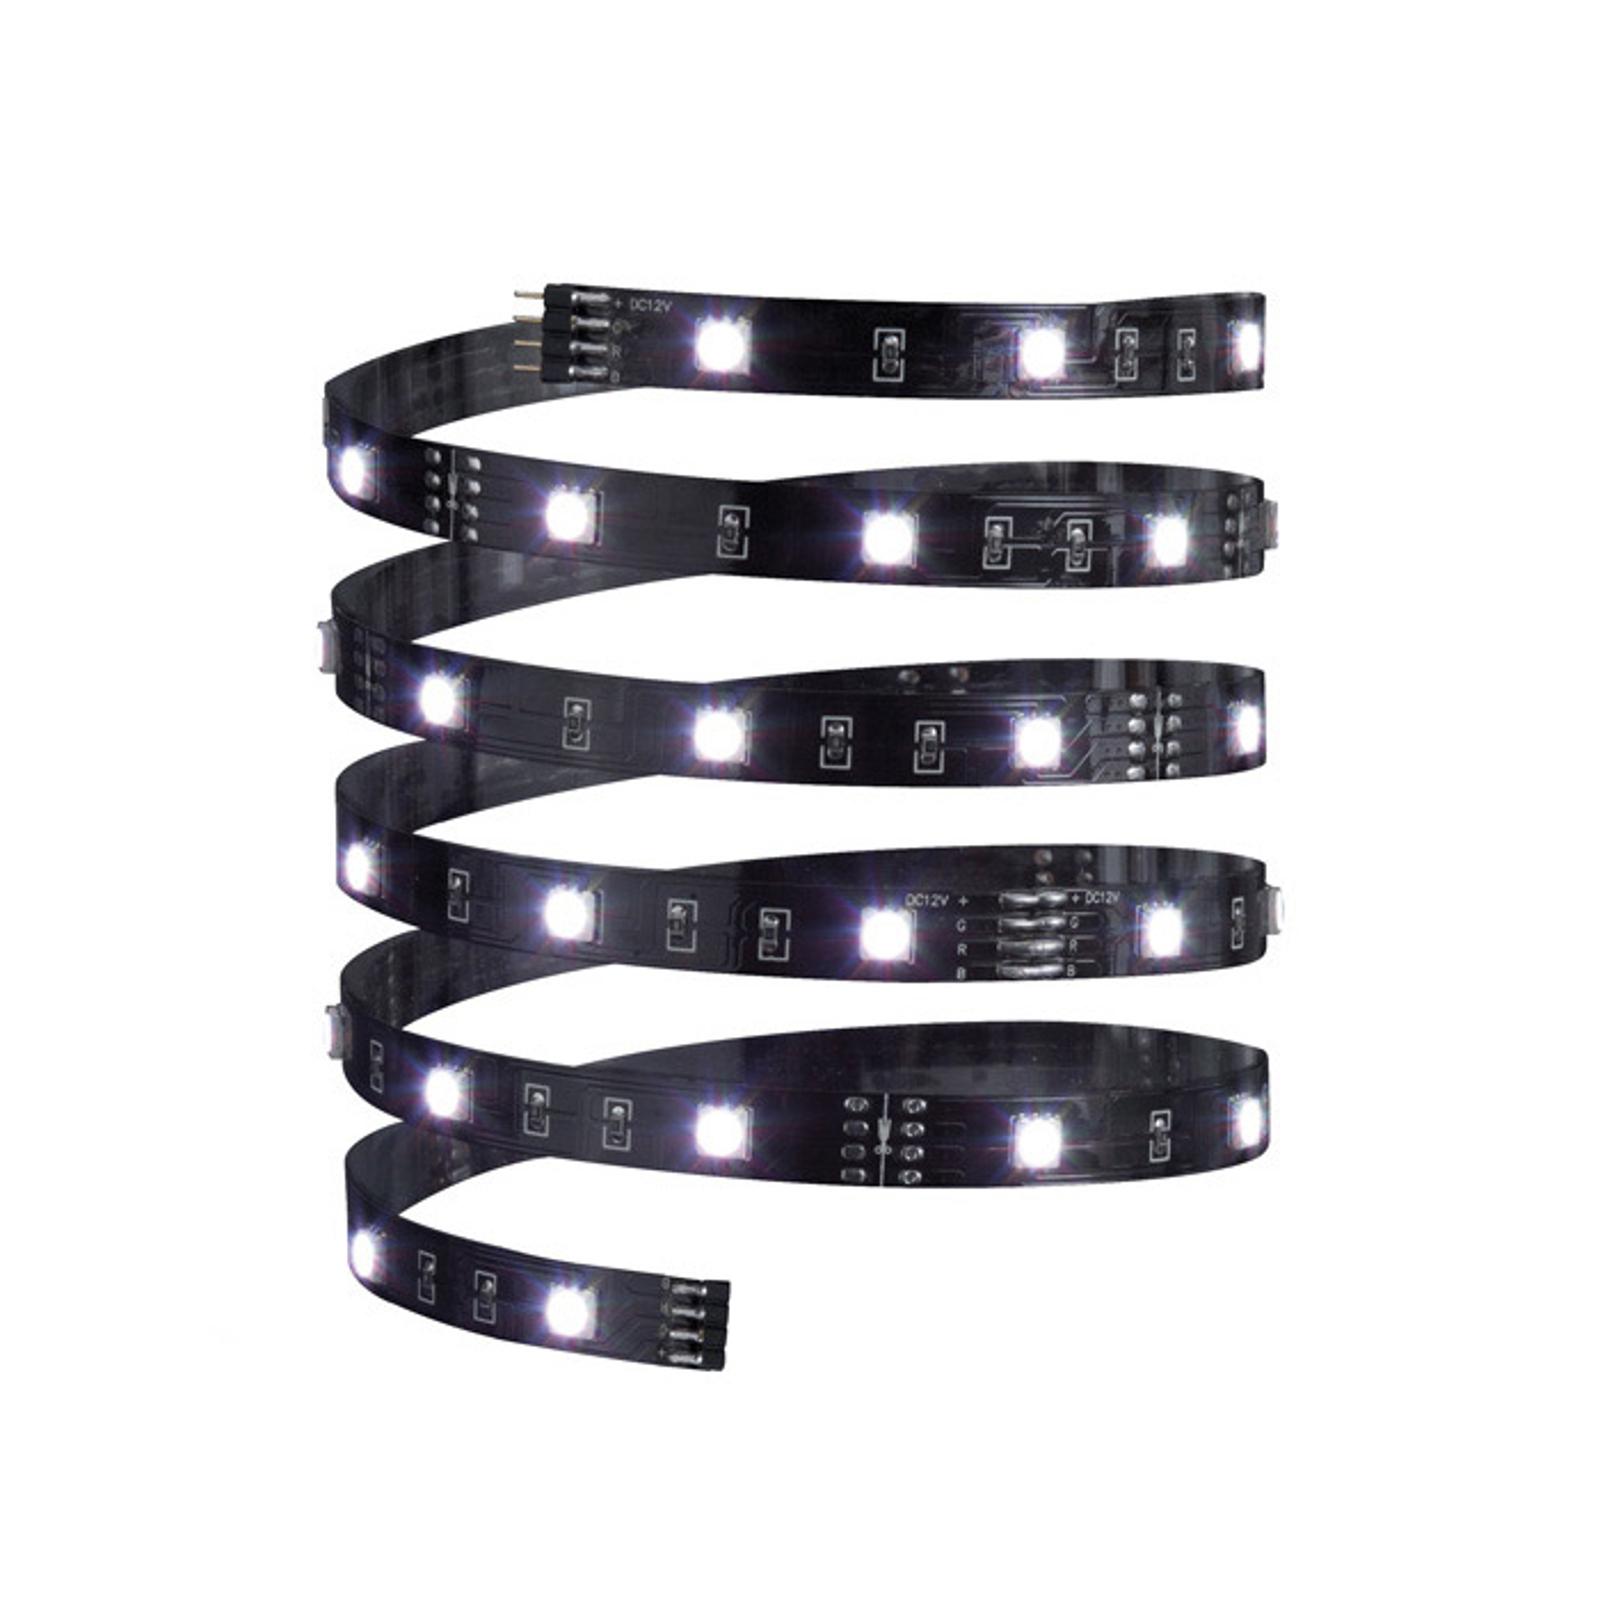 Paulmann YourLED Eco LED-Strip, 3m RGB schwarz